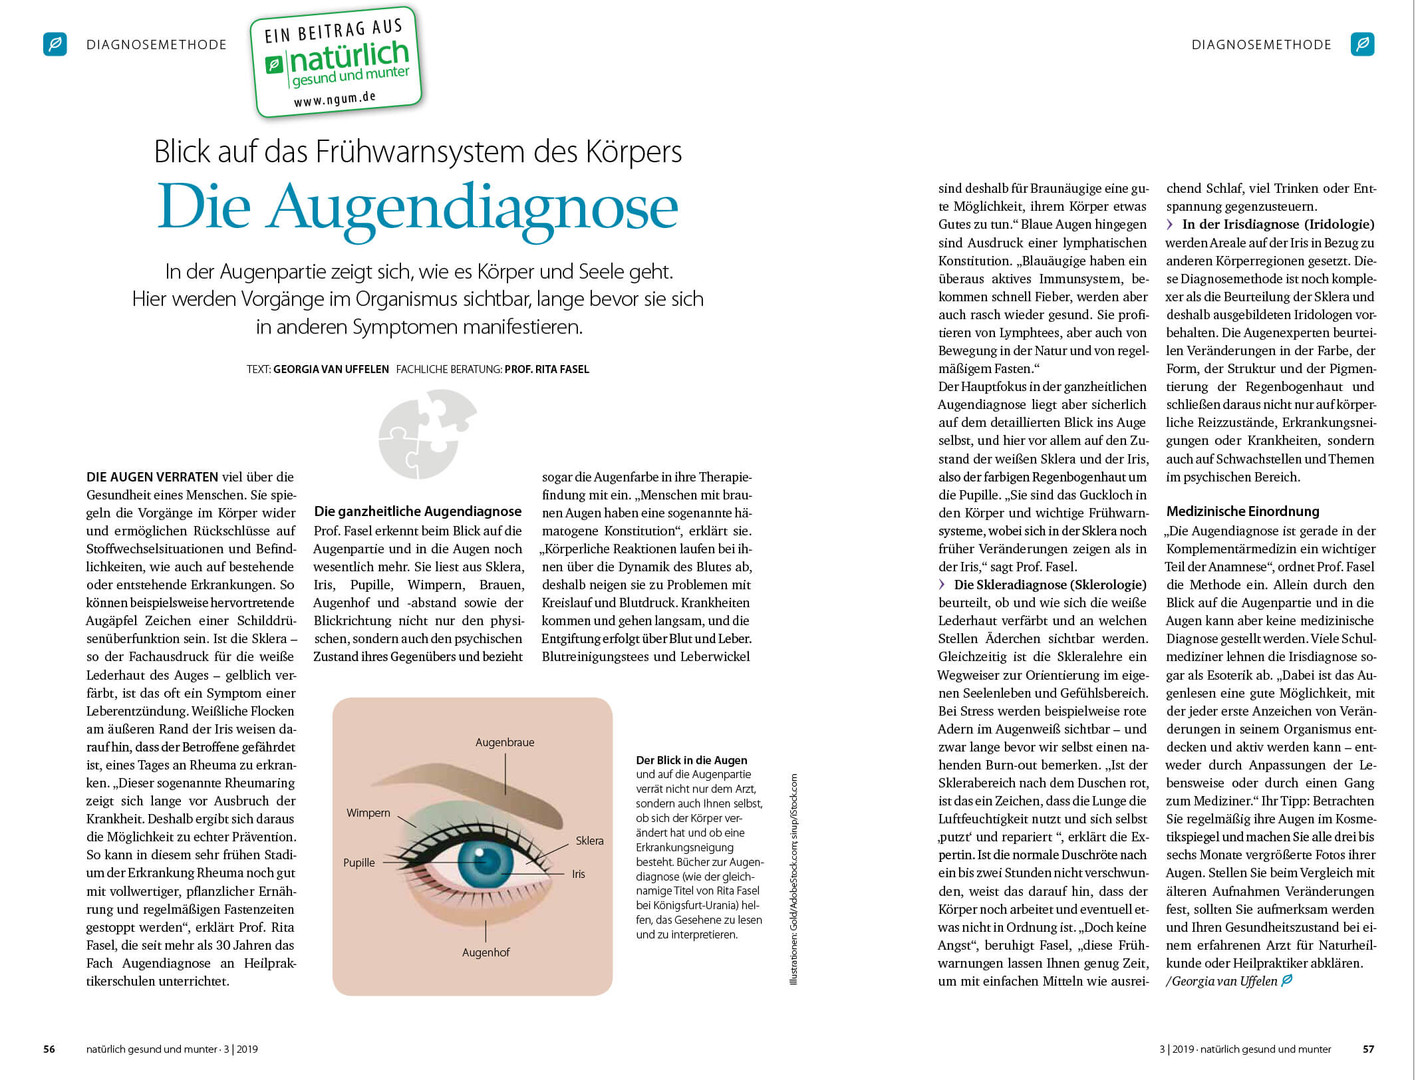 2019_04_12_Augendiagnose_3_tiny.jpg